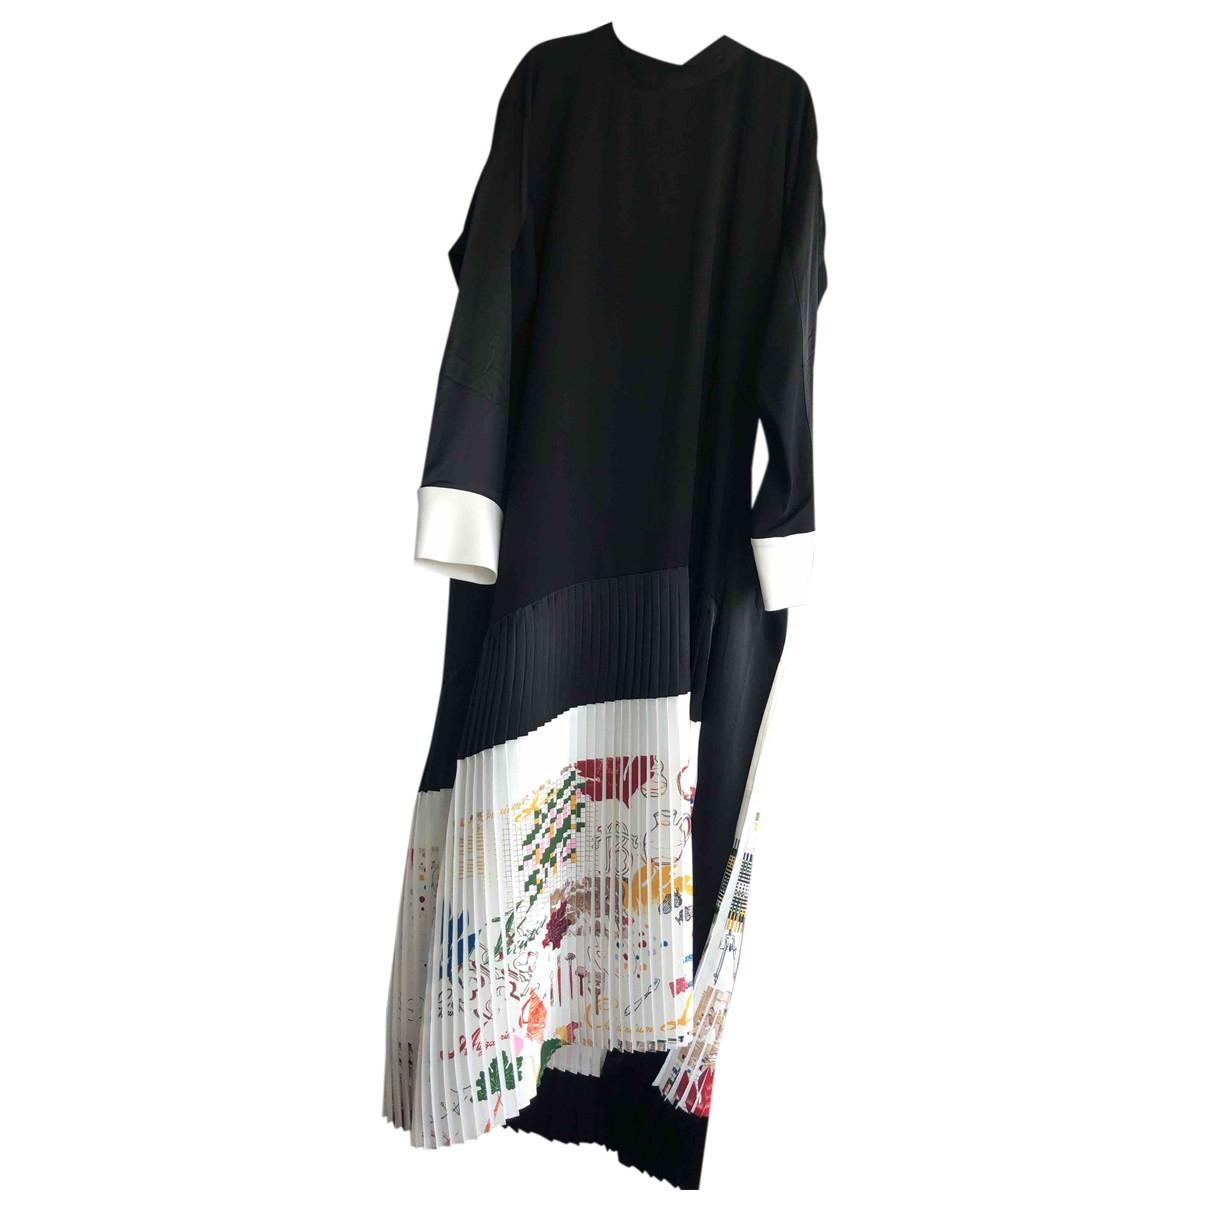 Tory Burch N dress for Women M International